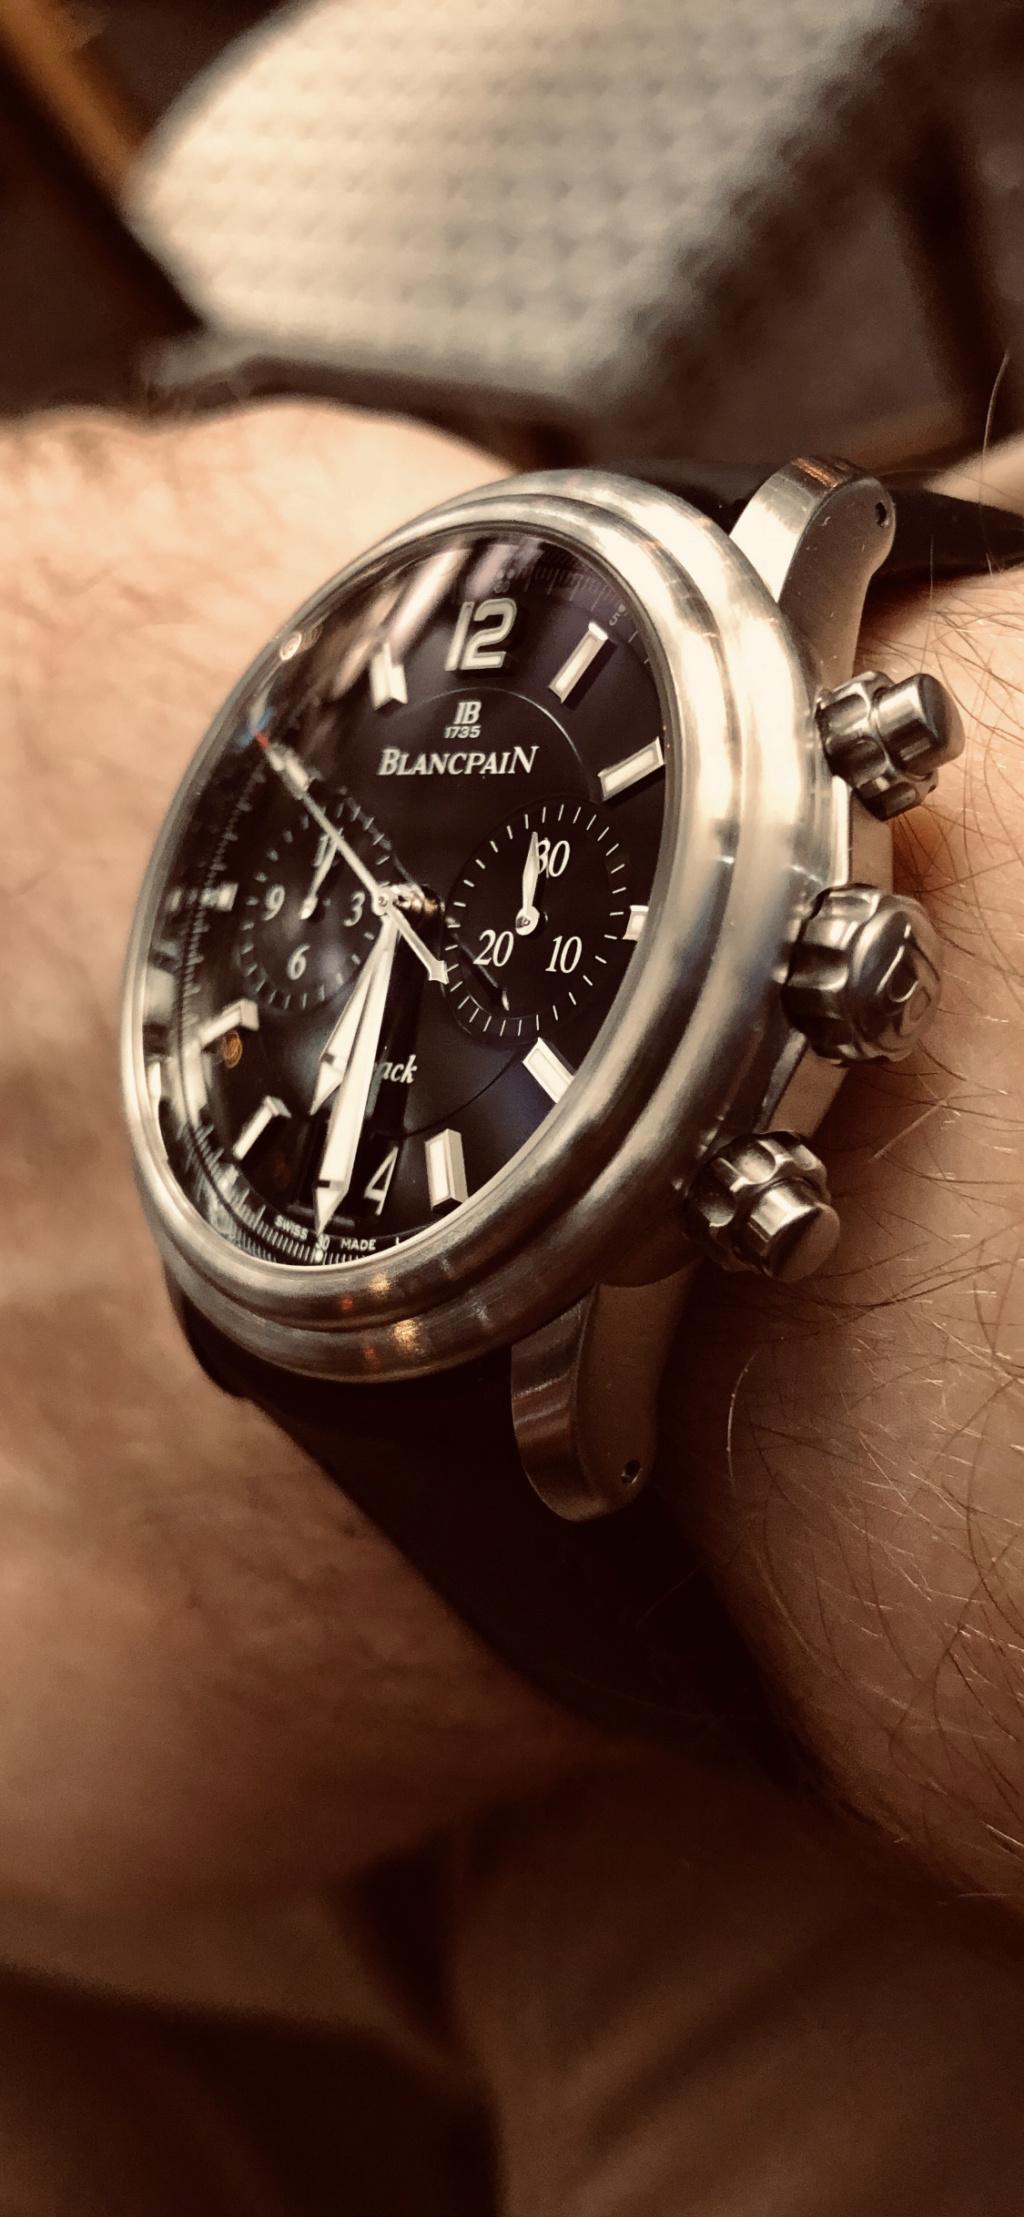 Ma nouvelle : Blancpain Chrono Leman Flyback Img_4010